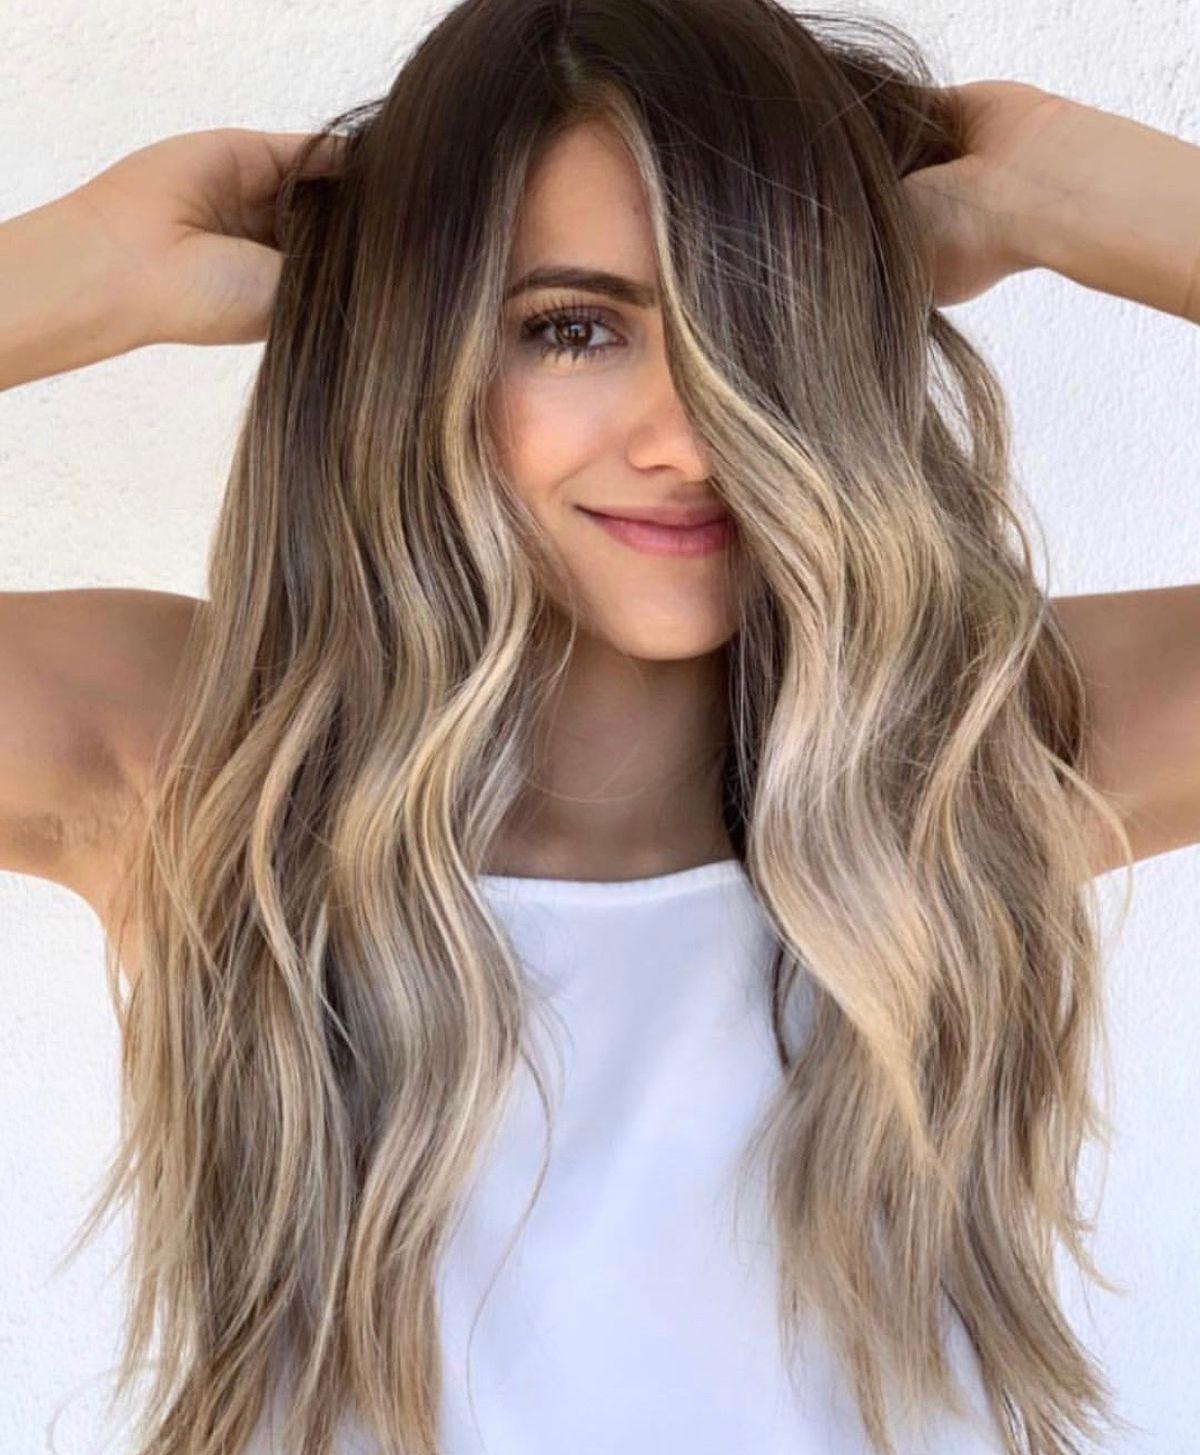 Hair Inspiration 2019-04-12 22:33:19